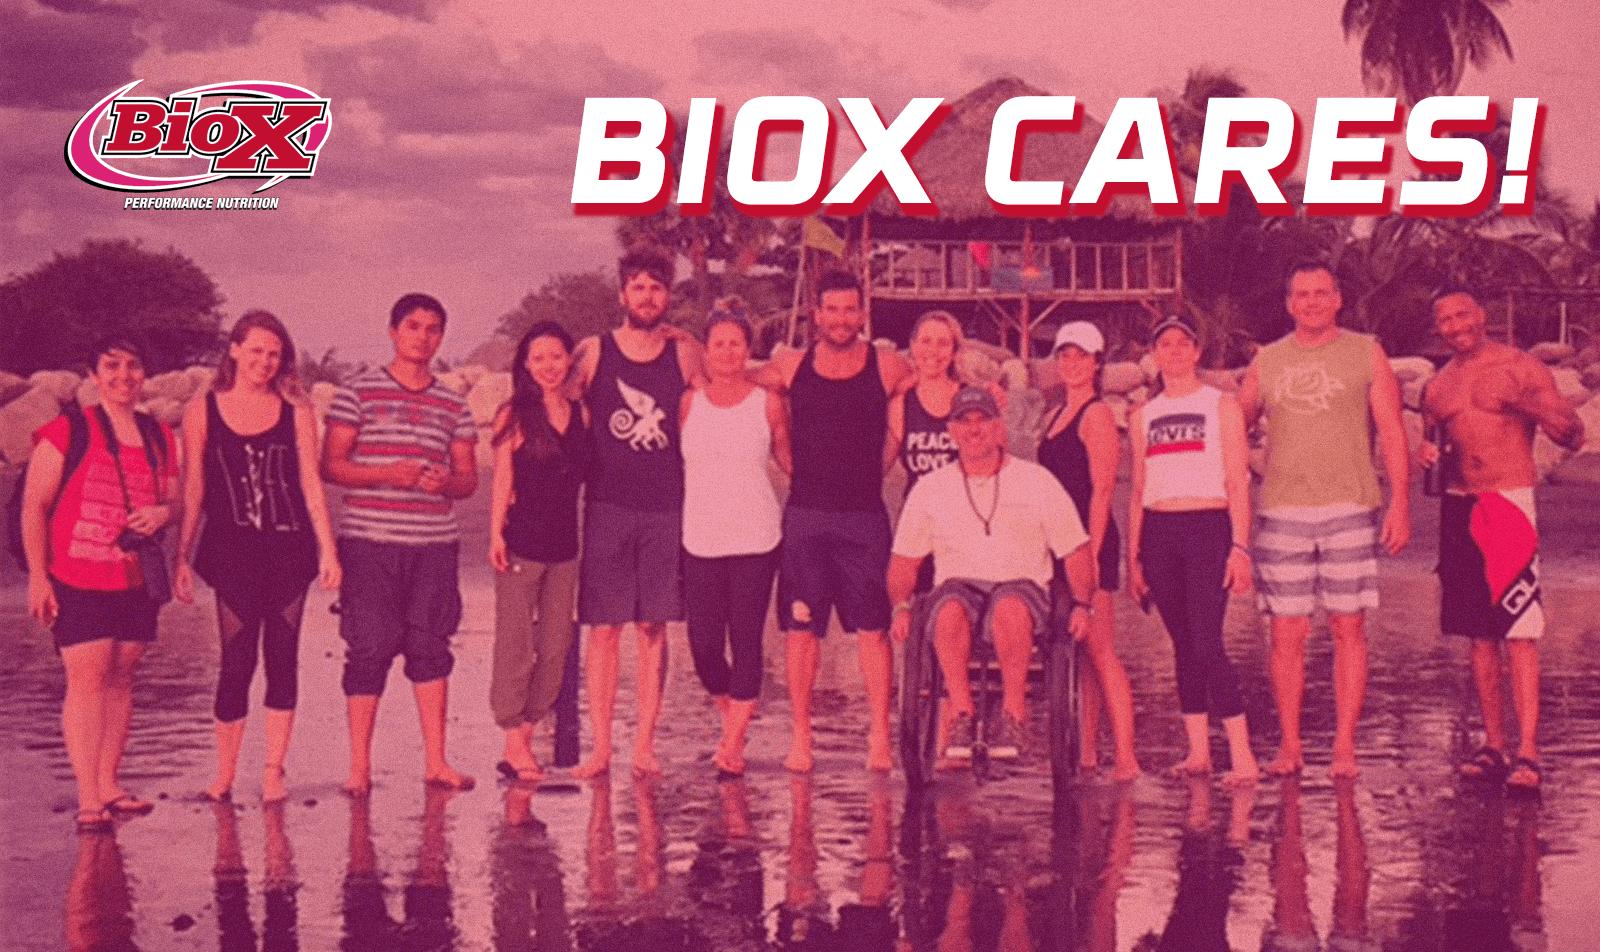 BioX Cares | Sponsored Athlete | BioX Performance Nutrition